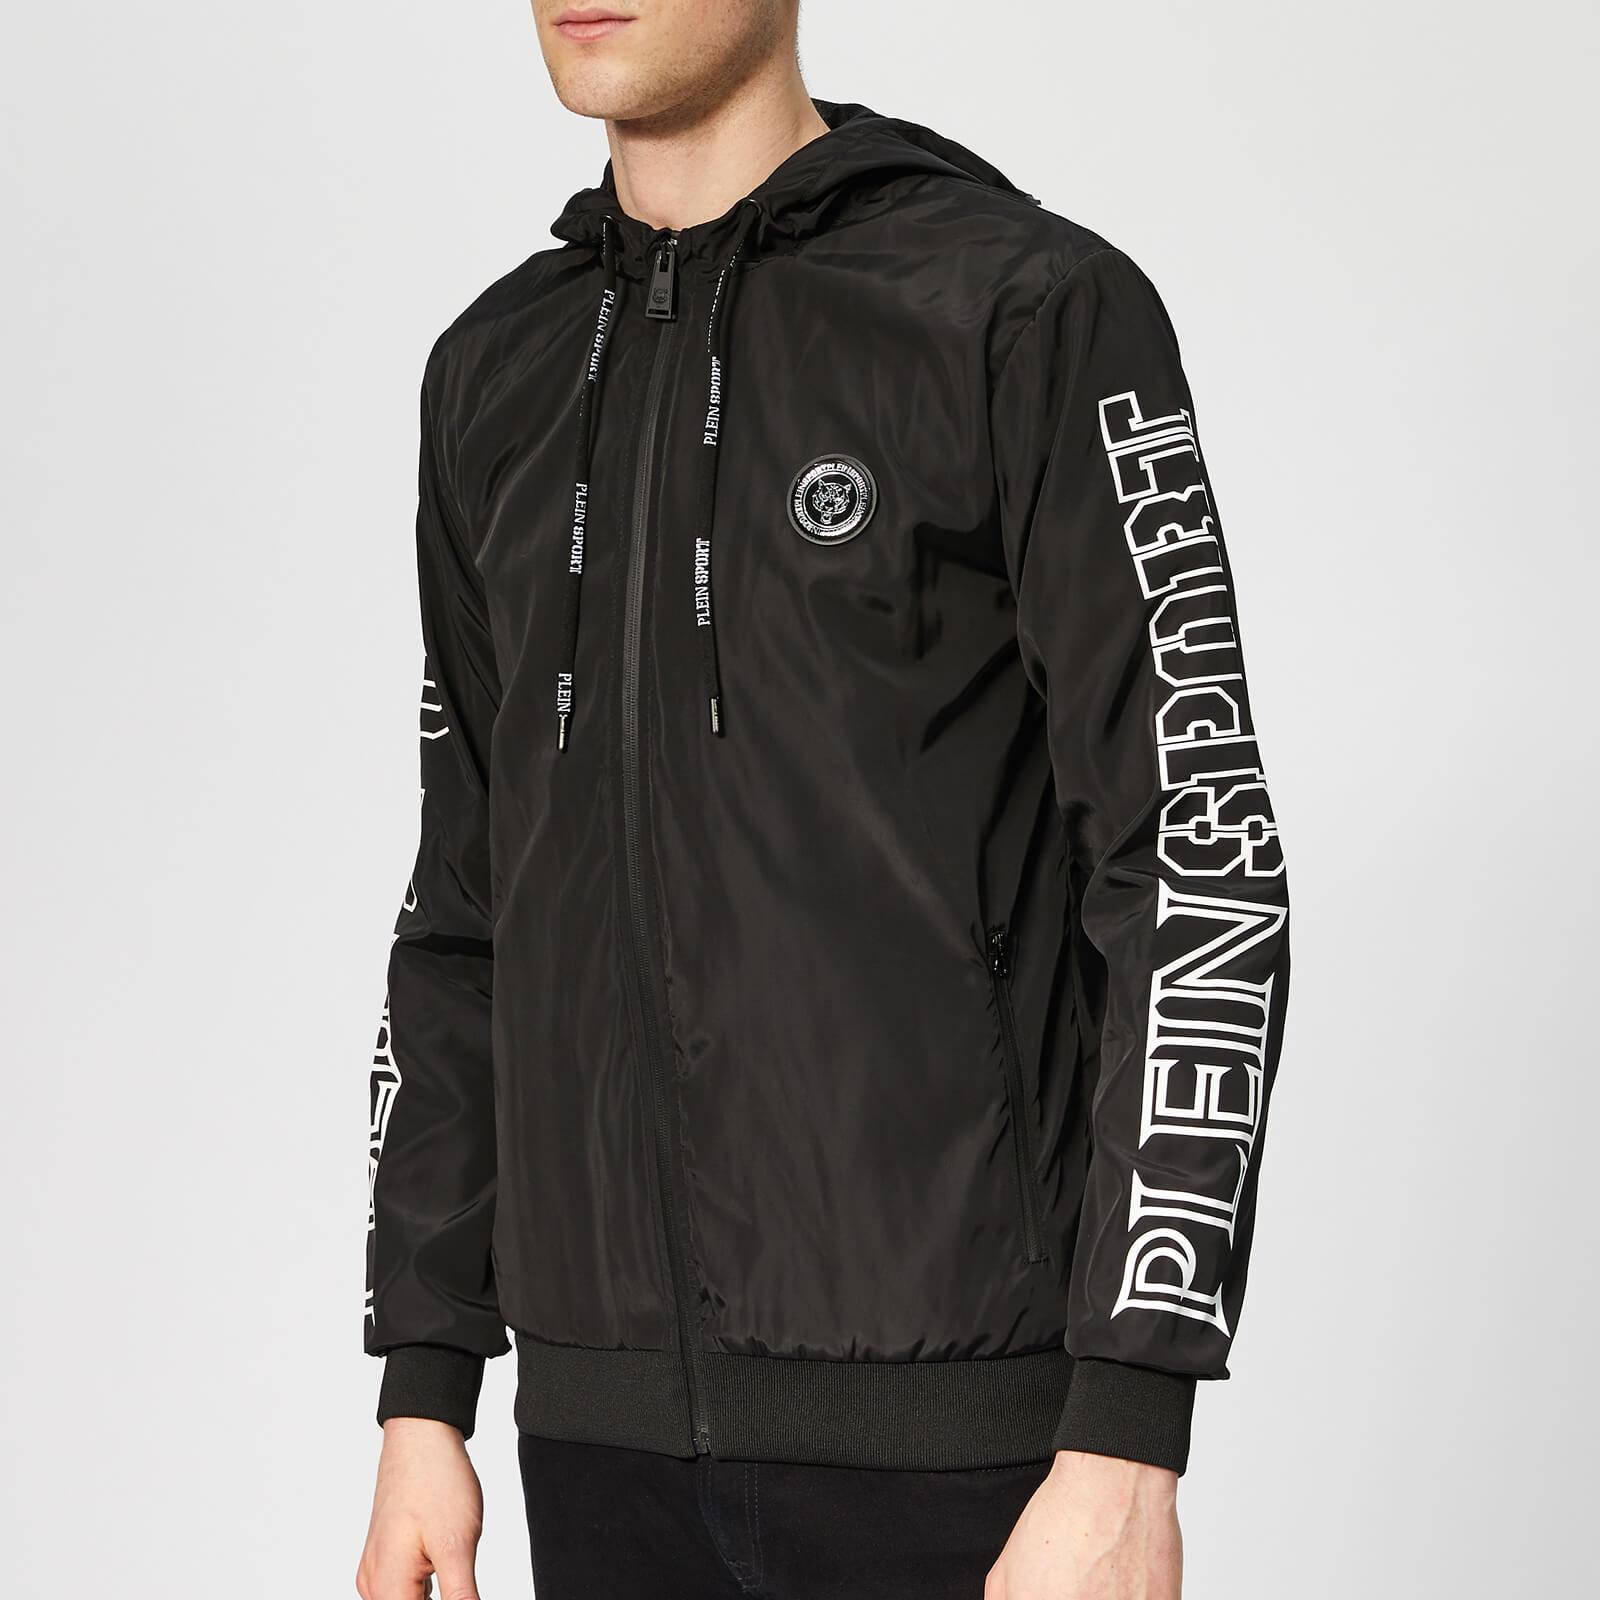 Plein Sport Men's Statement Hooded Sweat Jacket - Black - L - Black